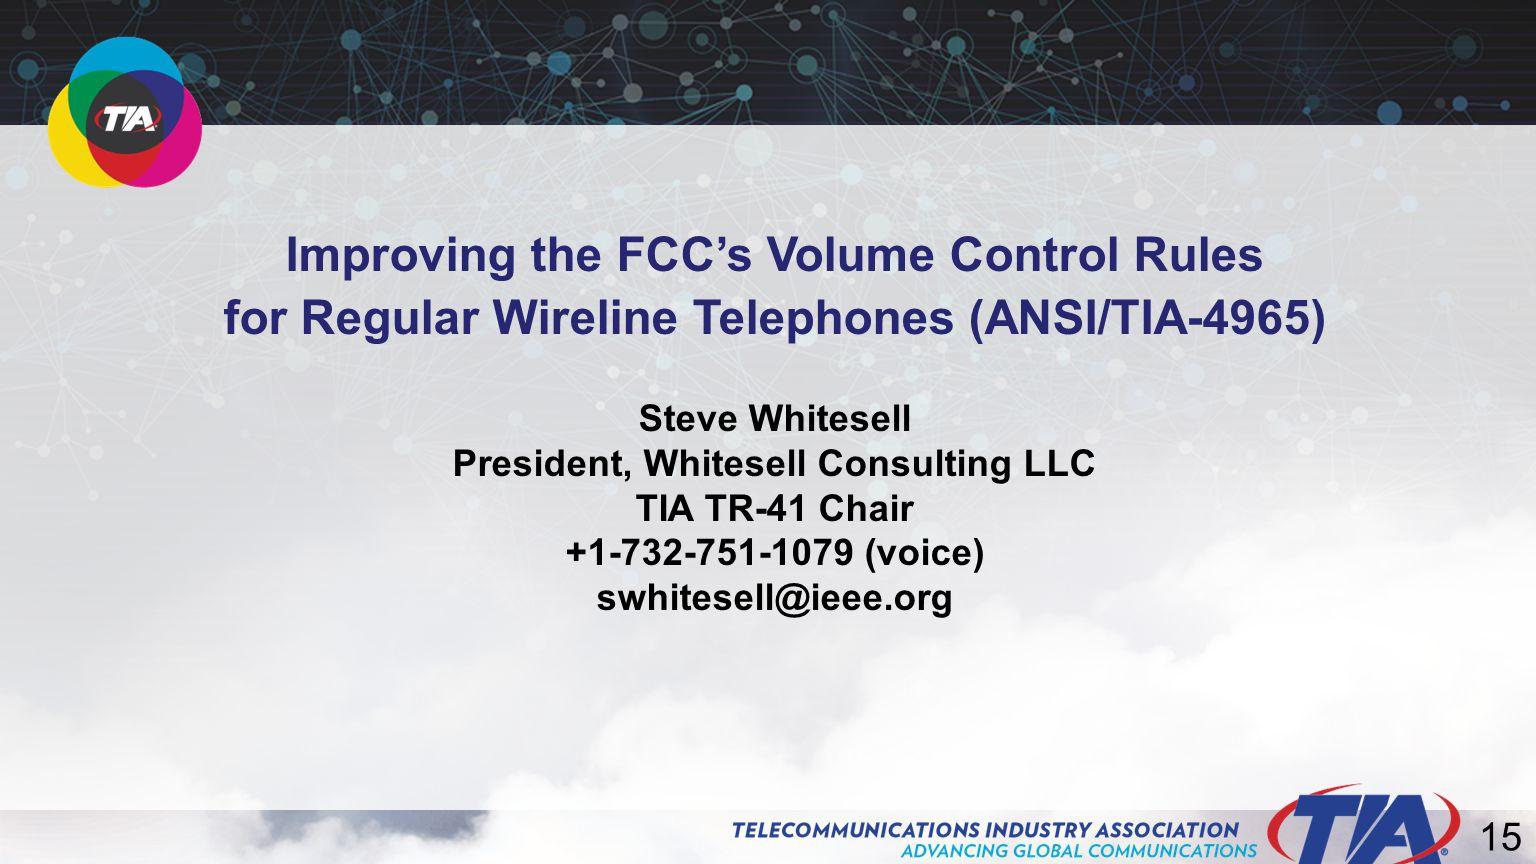 15 Improving the FCC's Volume Control Rules for Regular Wireline Telephones (ANSI/TIA-4965) Steve Whitesell President, Whitesell Consulting LLC TIA TR-41 Chair +1-732-751-1079 (voice) swhitesell@ieee.org